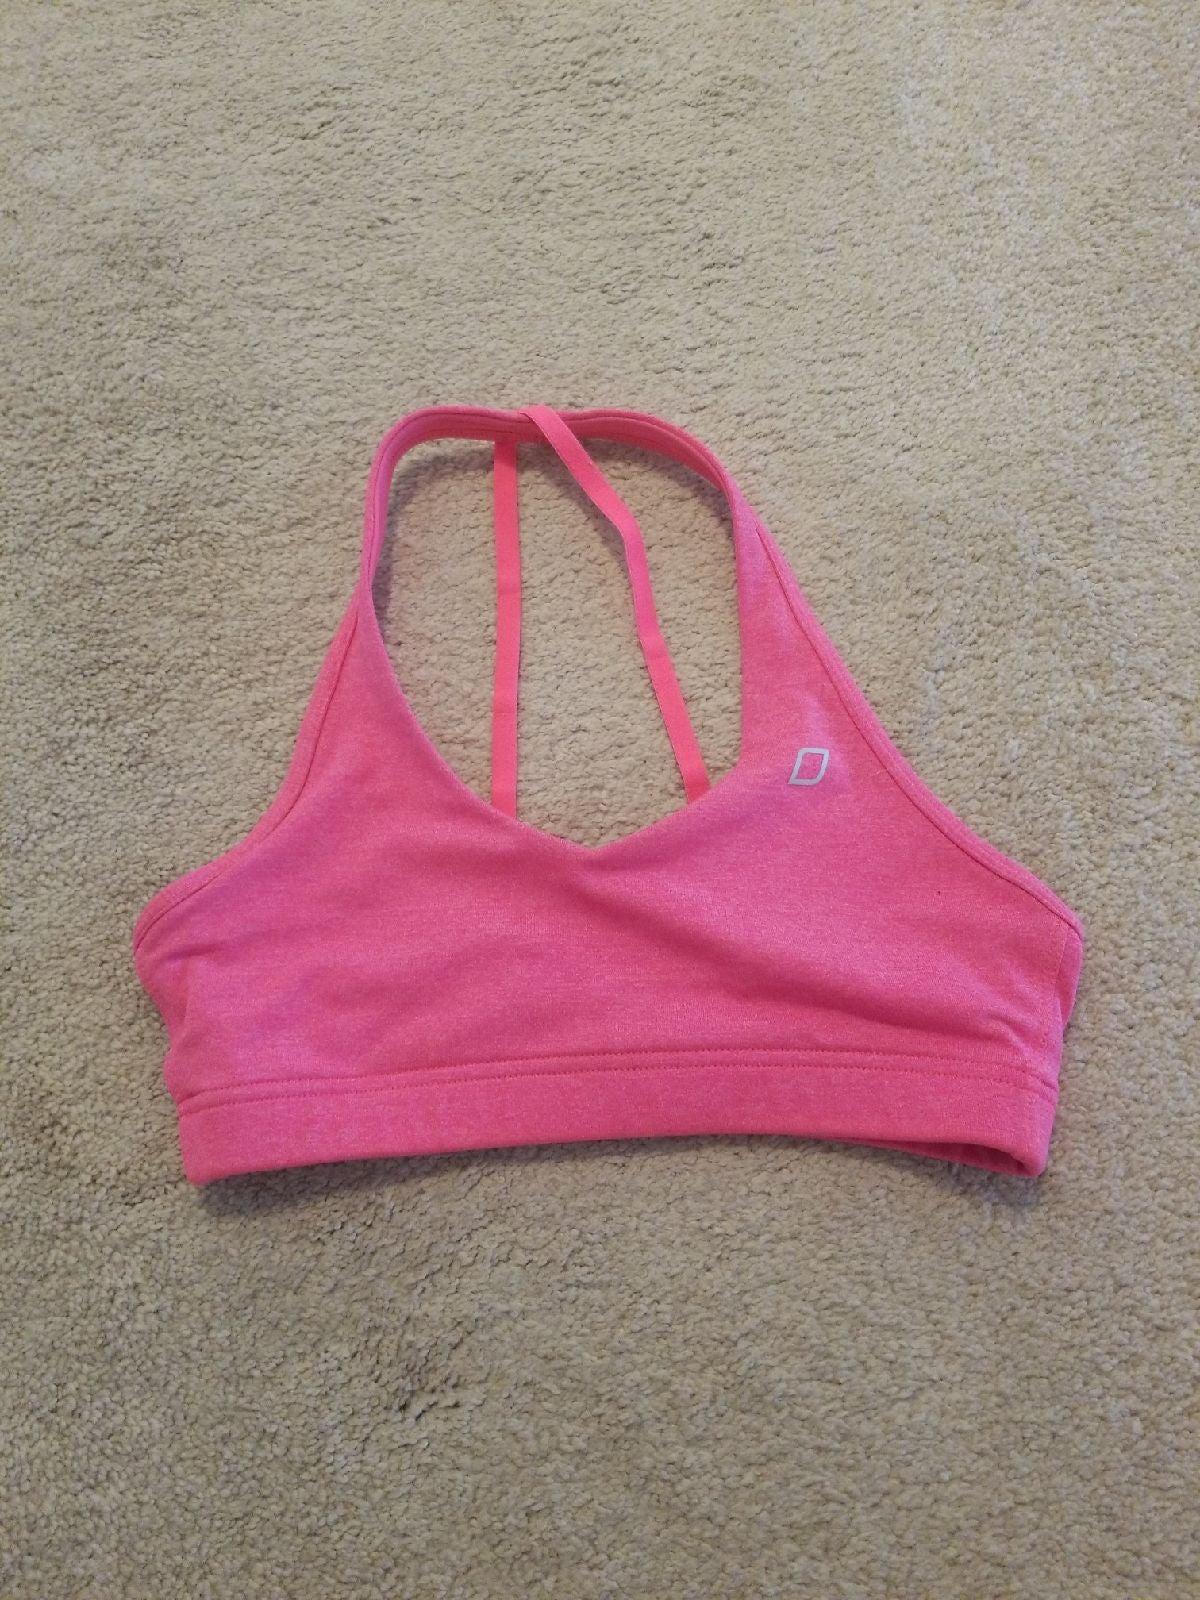 Lorna Jane bright pink halter top